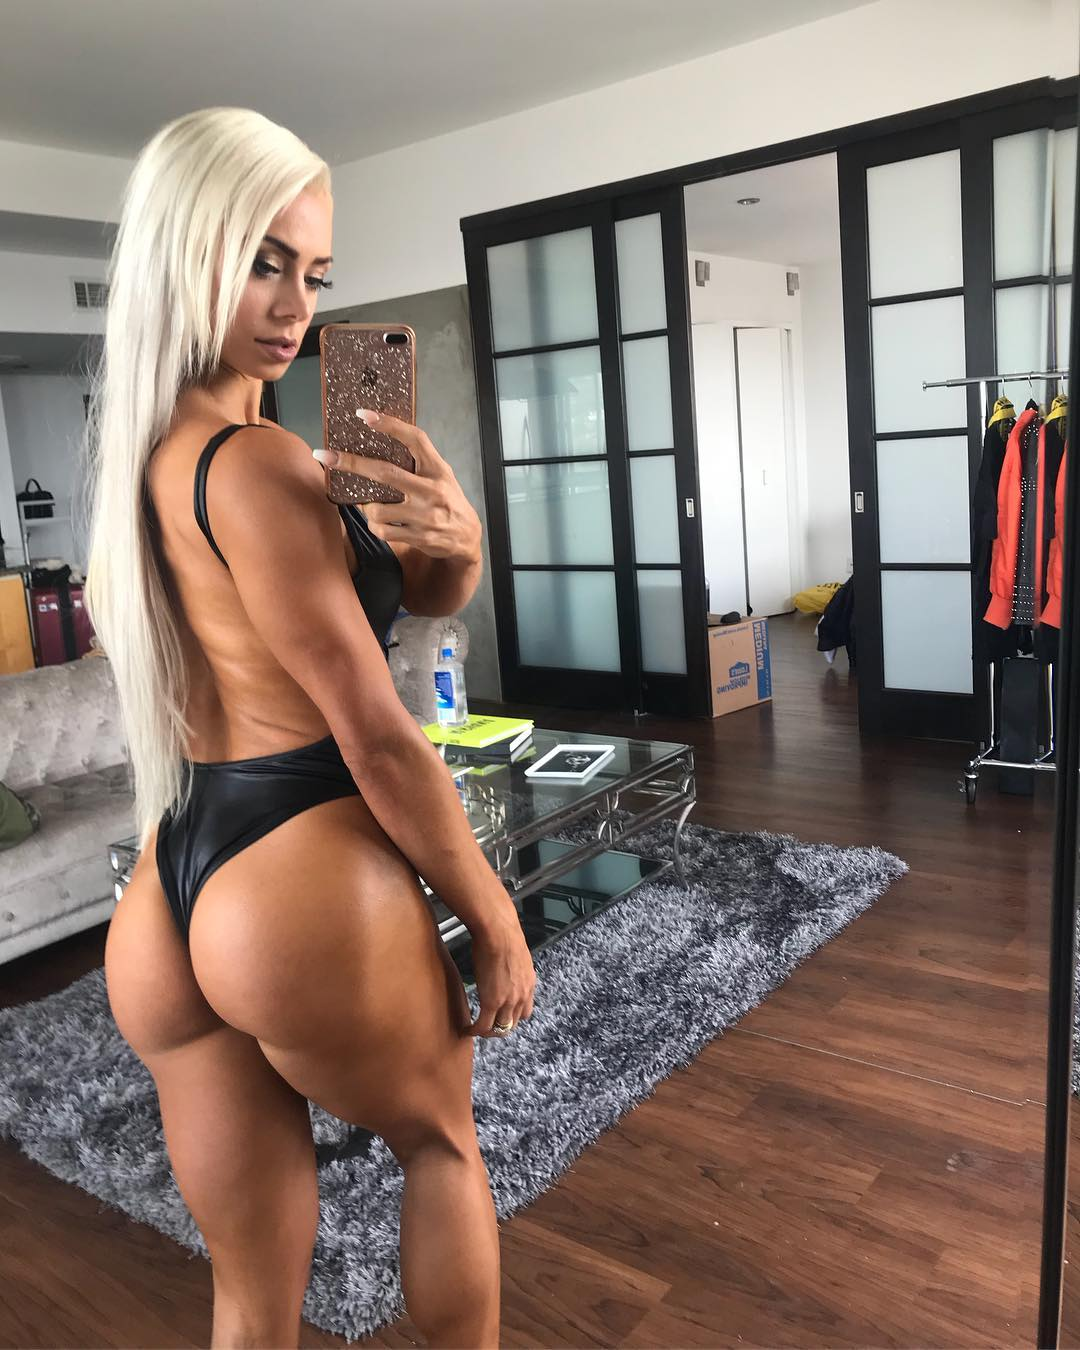 Ass Pics Lauren Simpson naked photo 2017